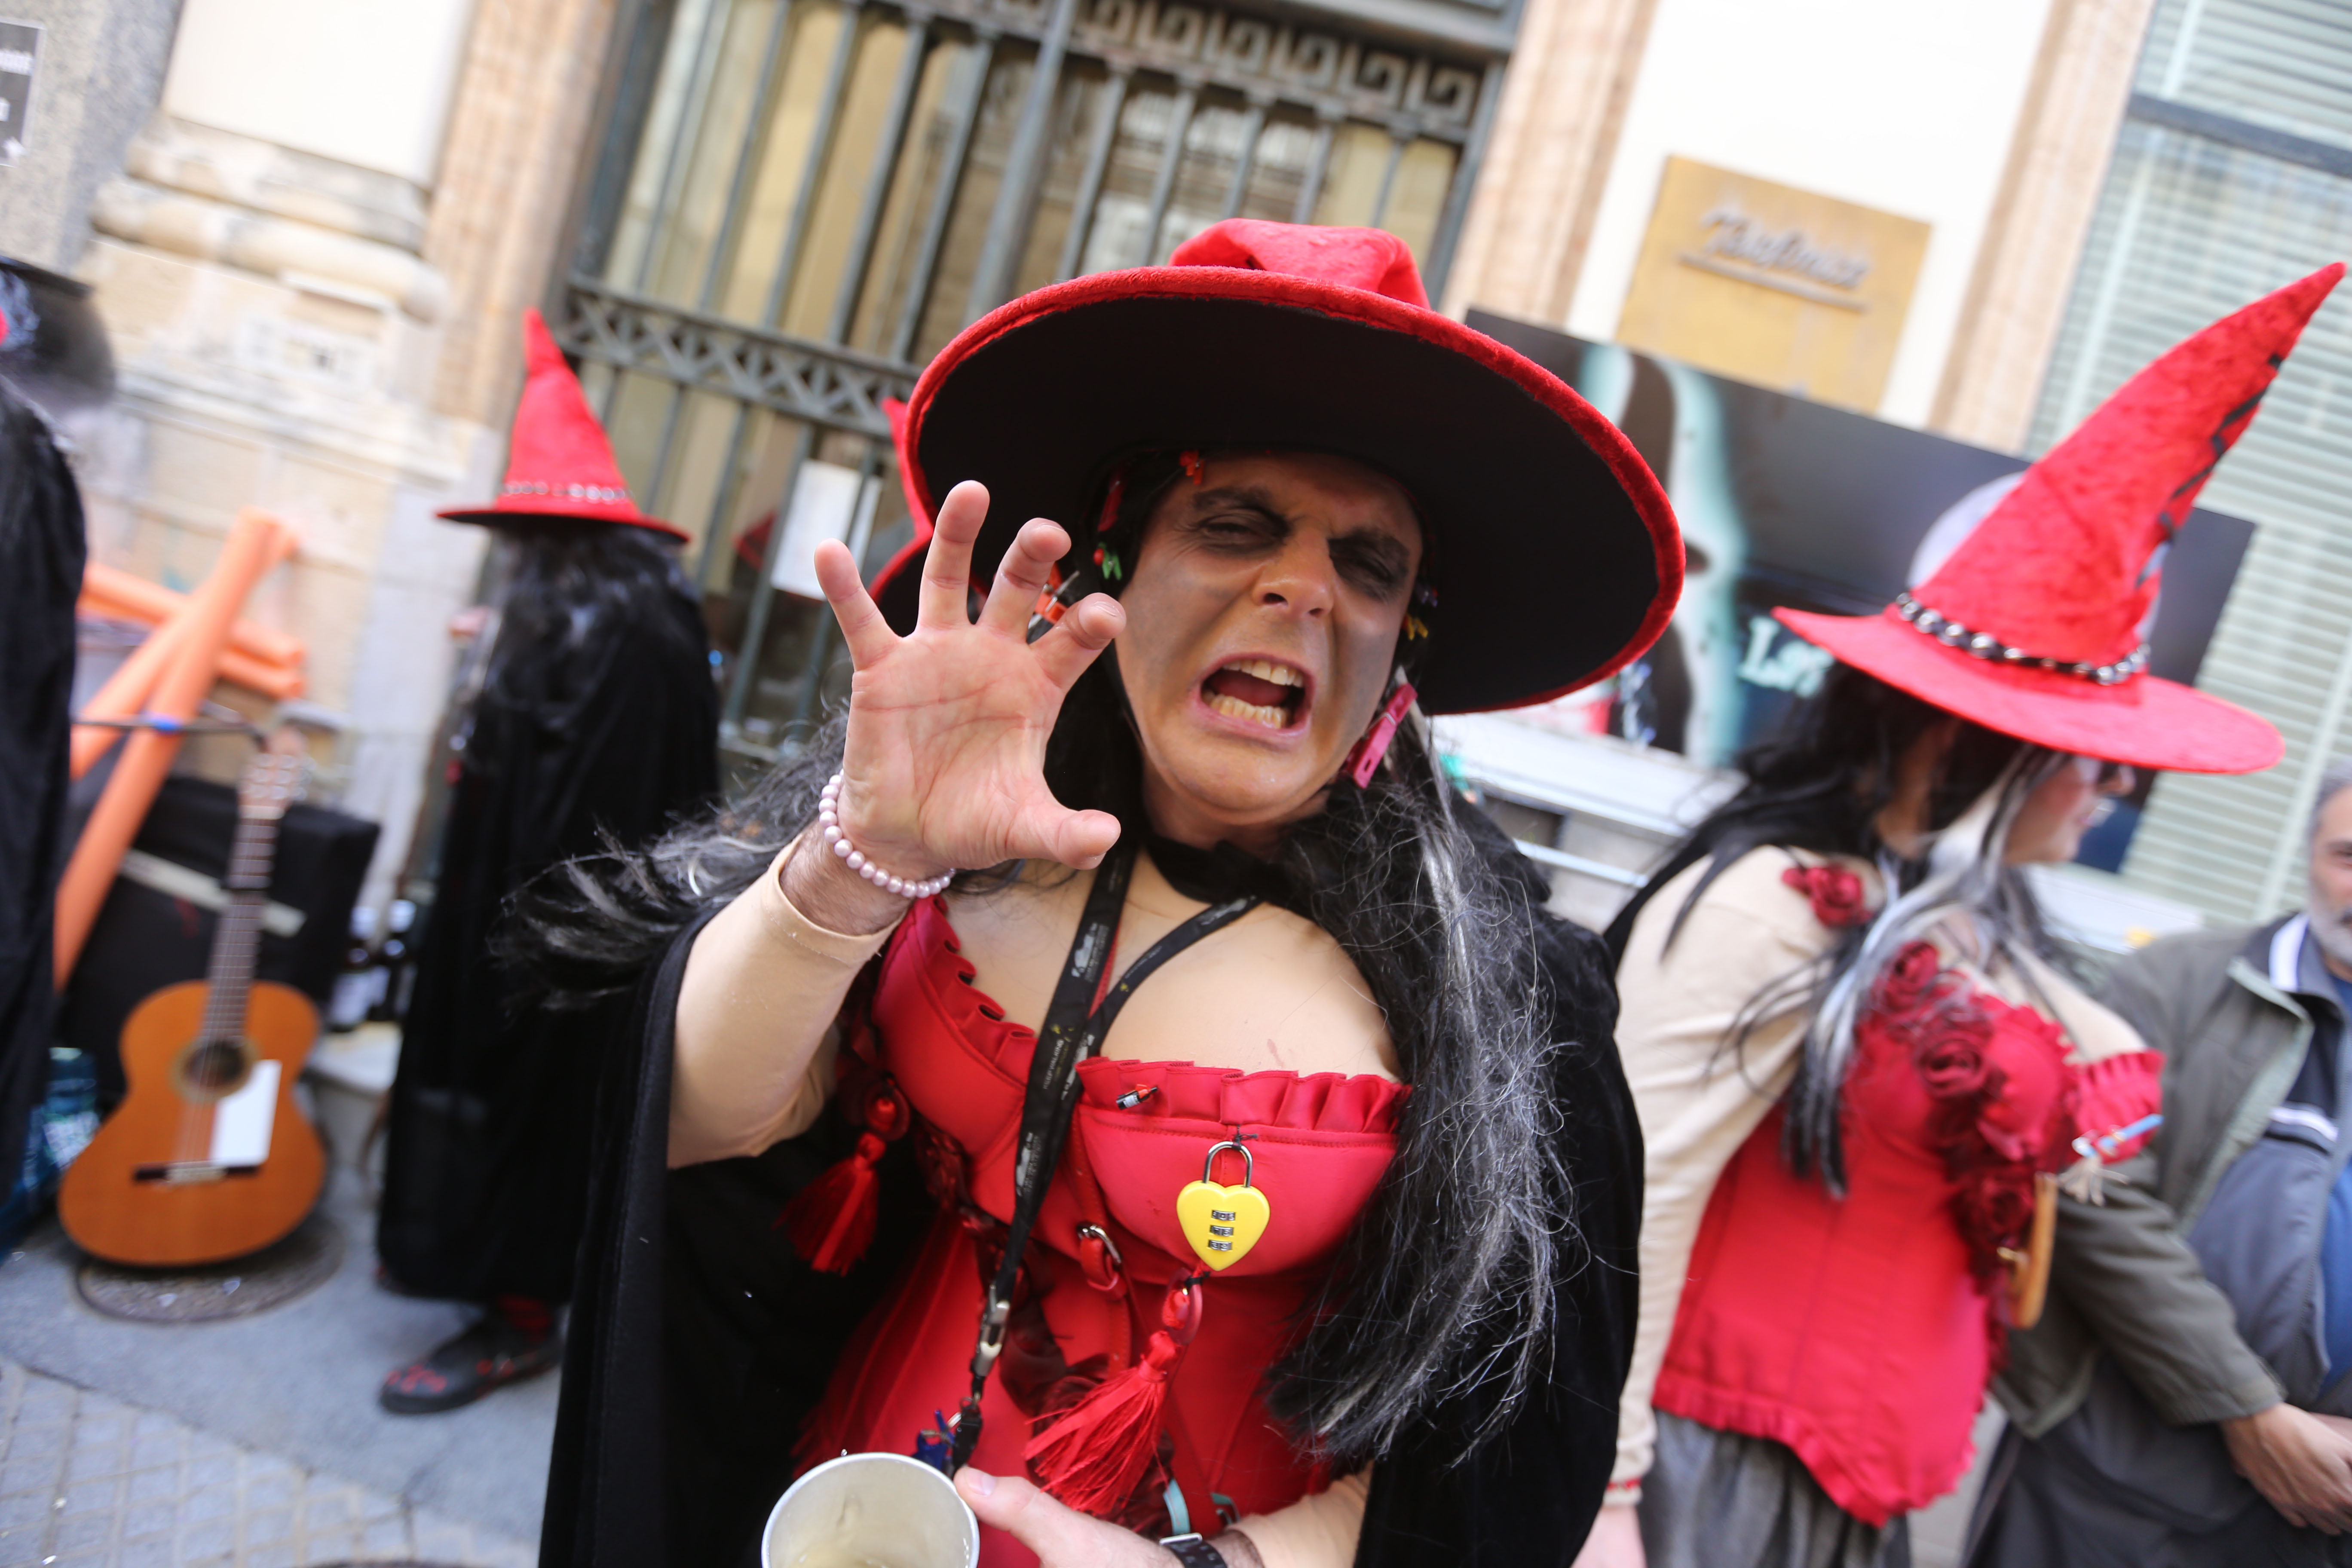 El Carnaval de Cádiz marcha a la conquista de Asturias